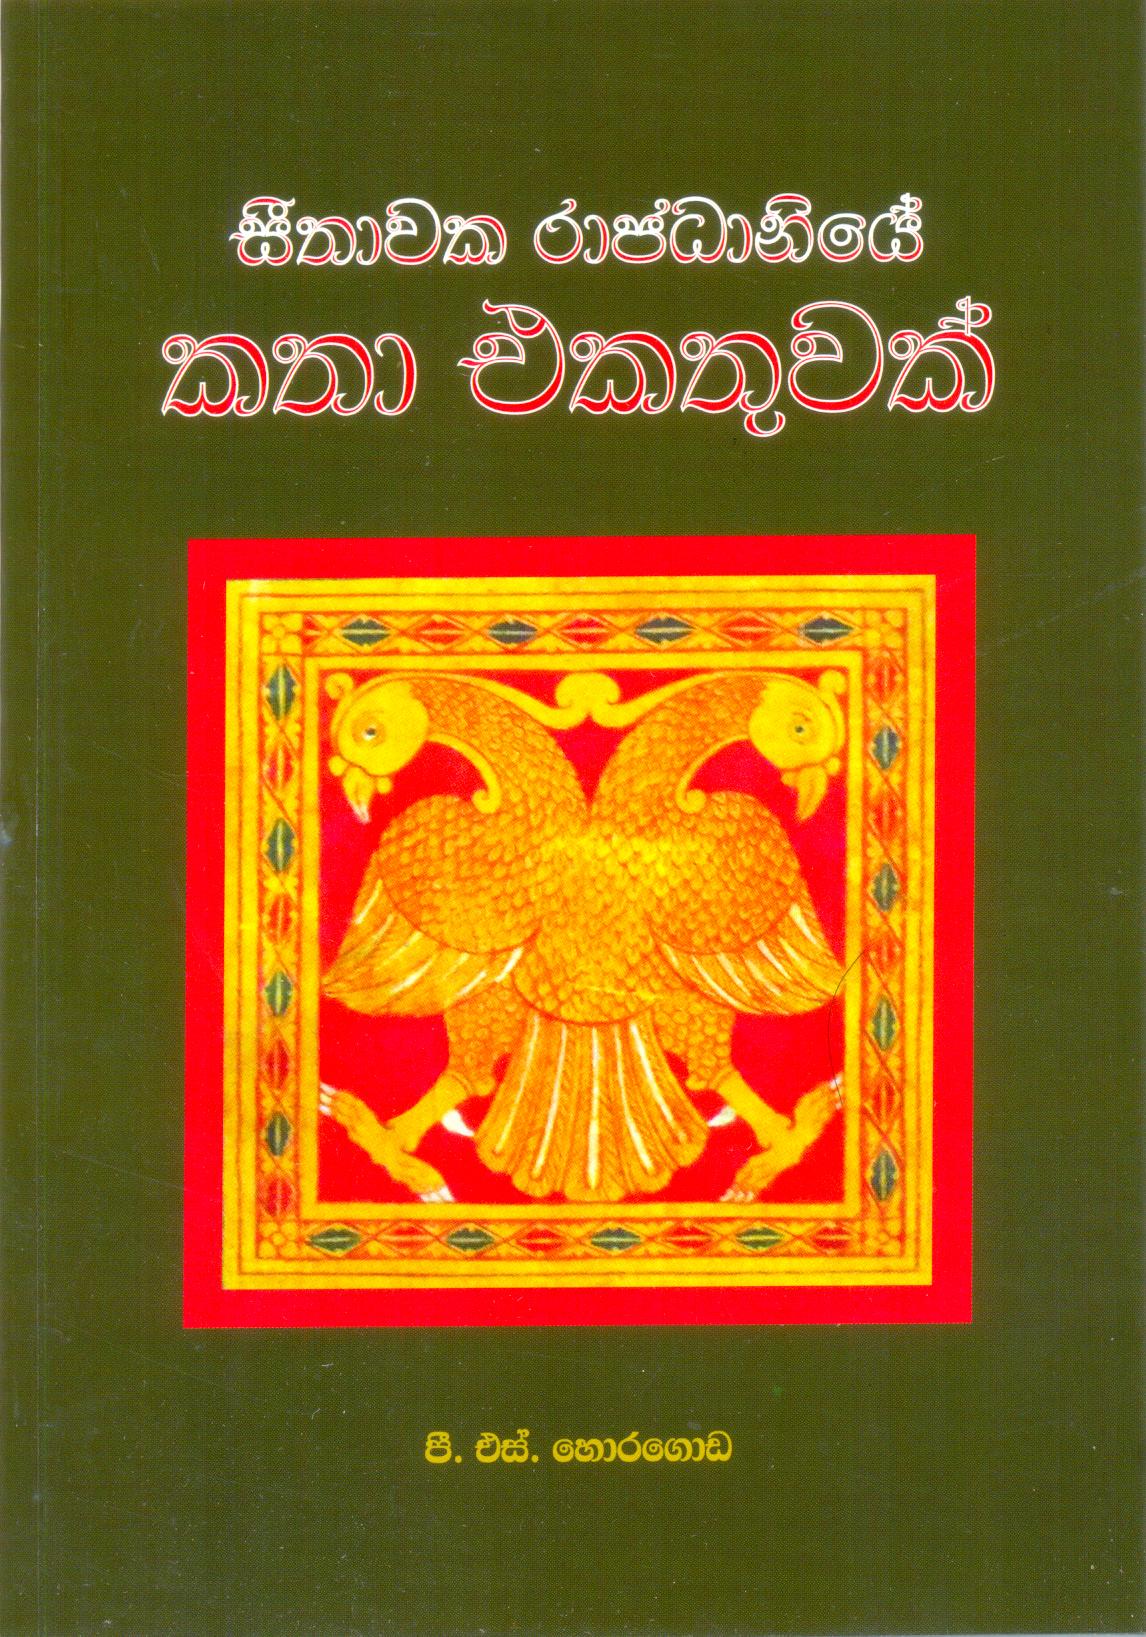 Sithawaka Rajadaniye  Katha Ekathuwak